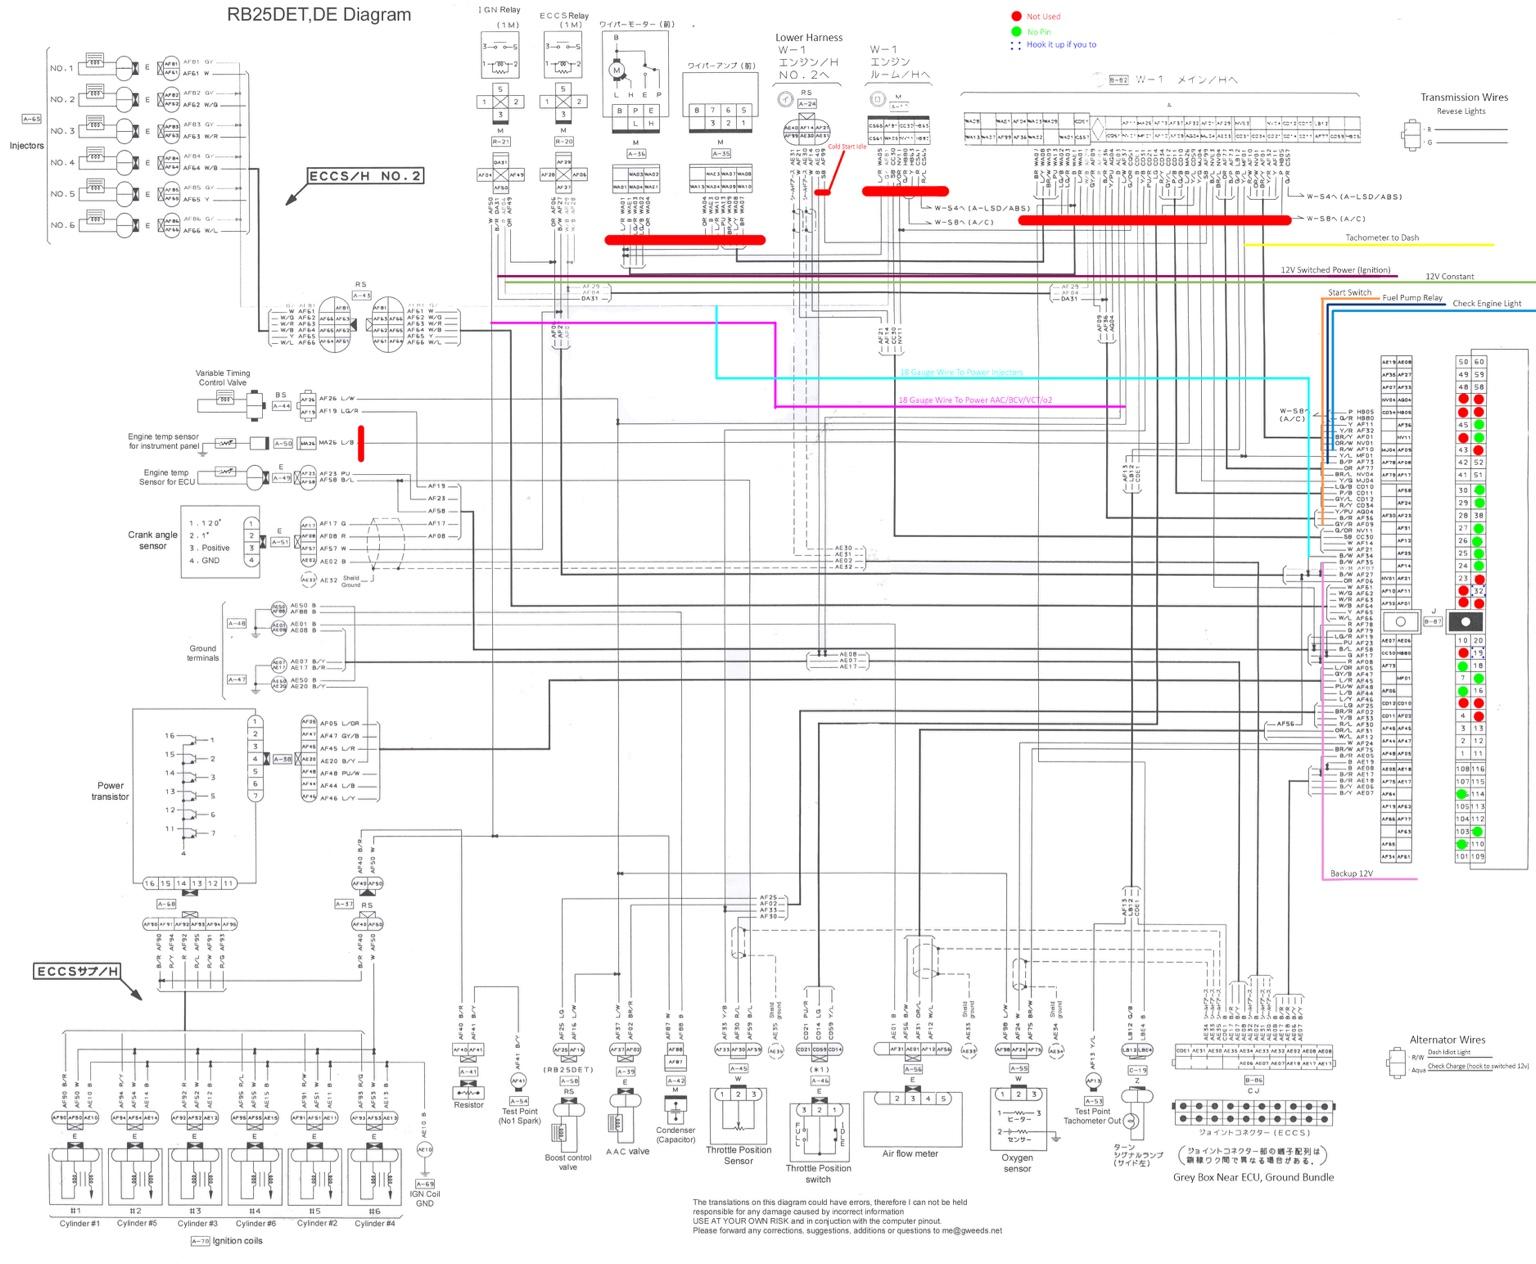 Nissan 350z ecu wiring diagram toyota corolla radio wiring diagram ka24de tps wiring diagram ka24de wirning diagrams c279bbf8b910537c4fcd50a23efe2c46 ka24de tps wiring diagramhtml nissan 350z ecu wiring diagram sciox Gallery